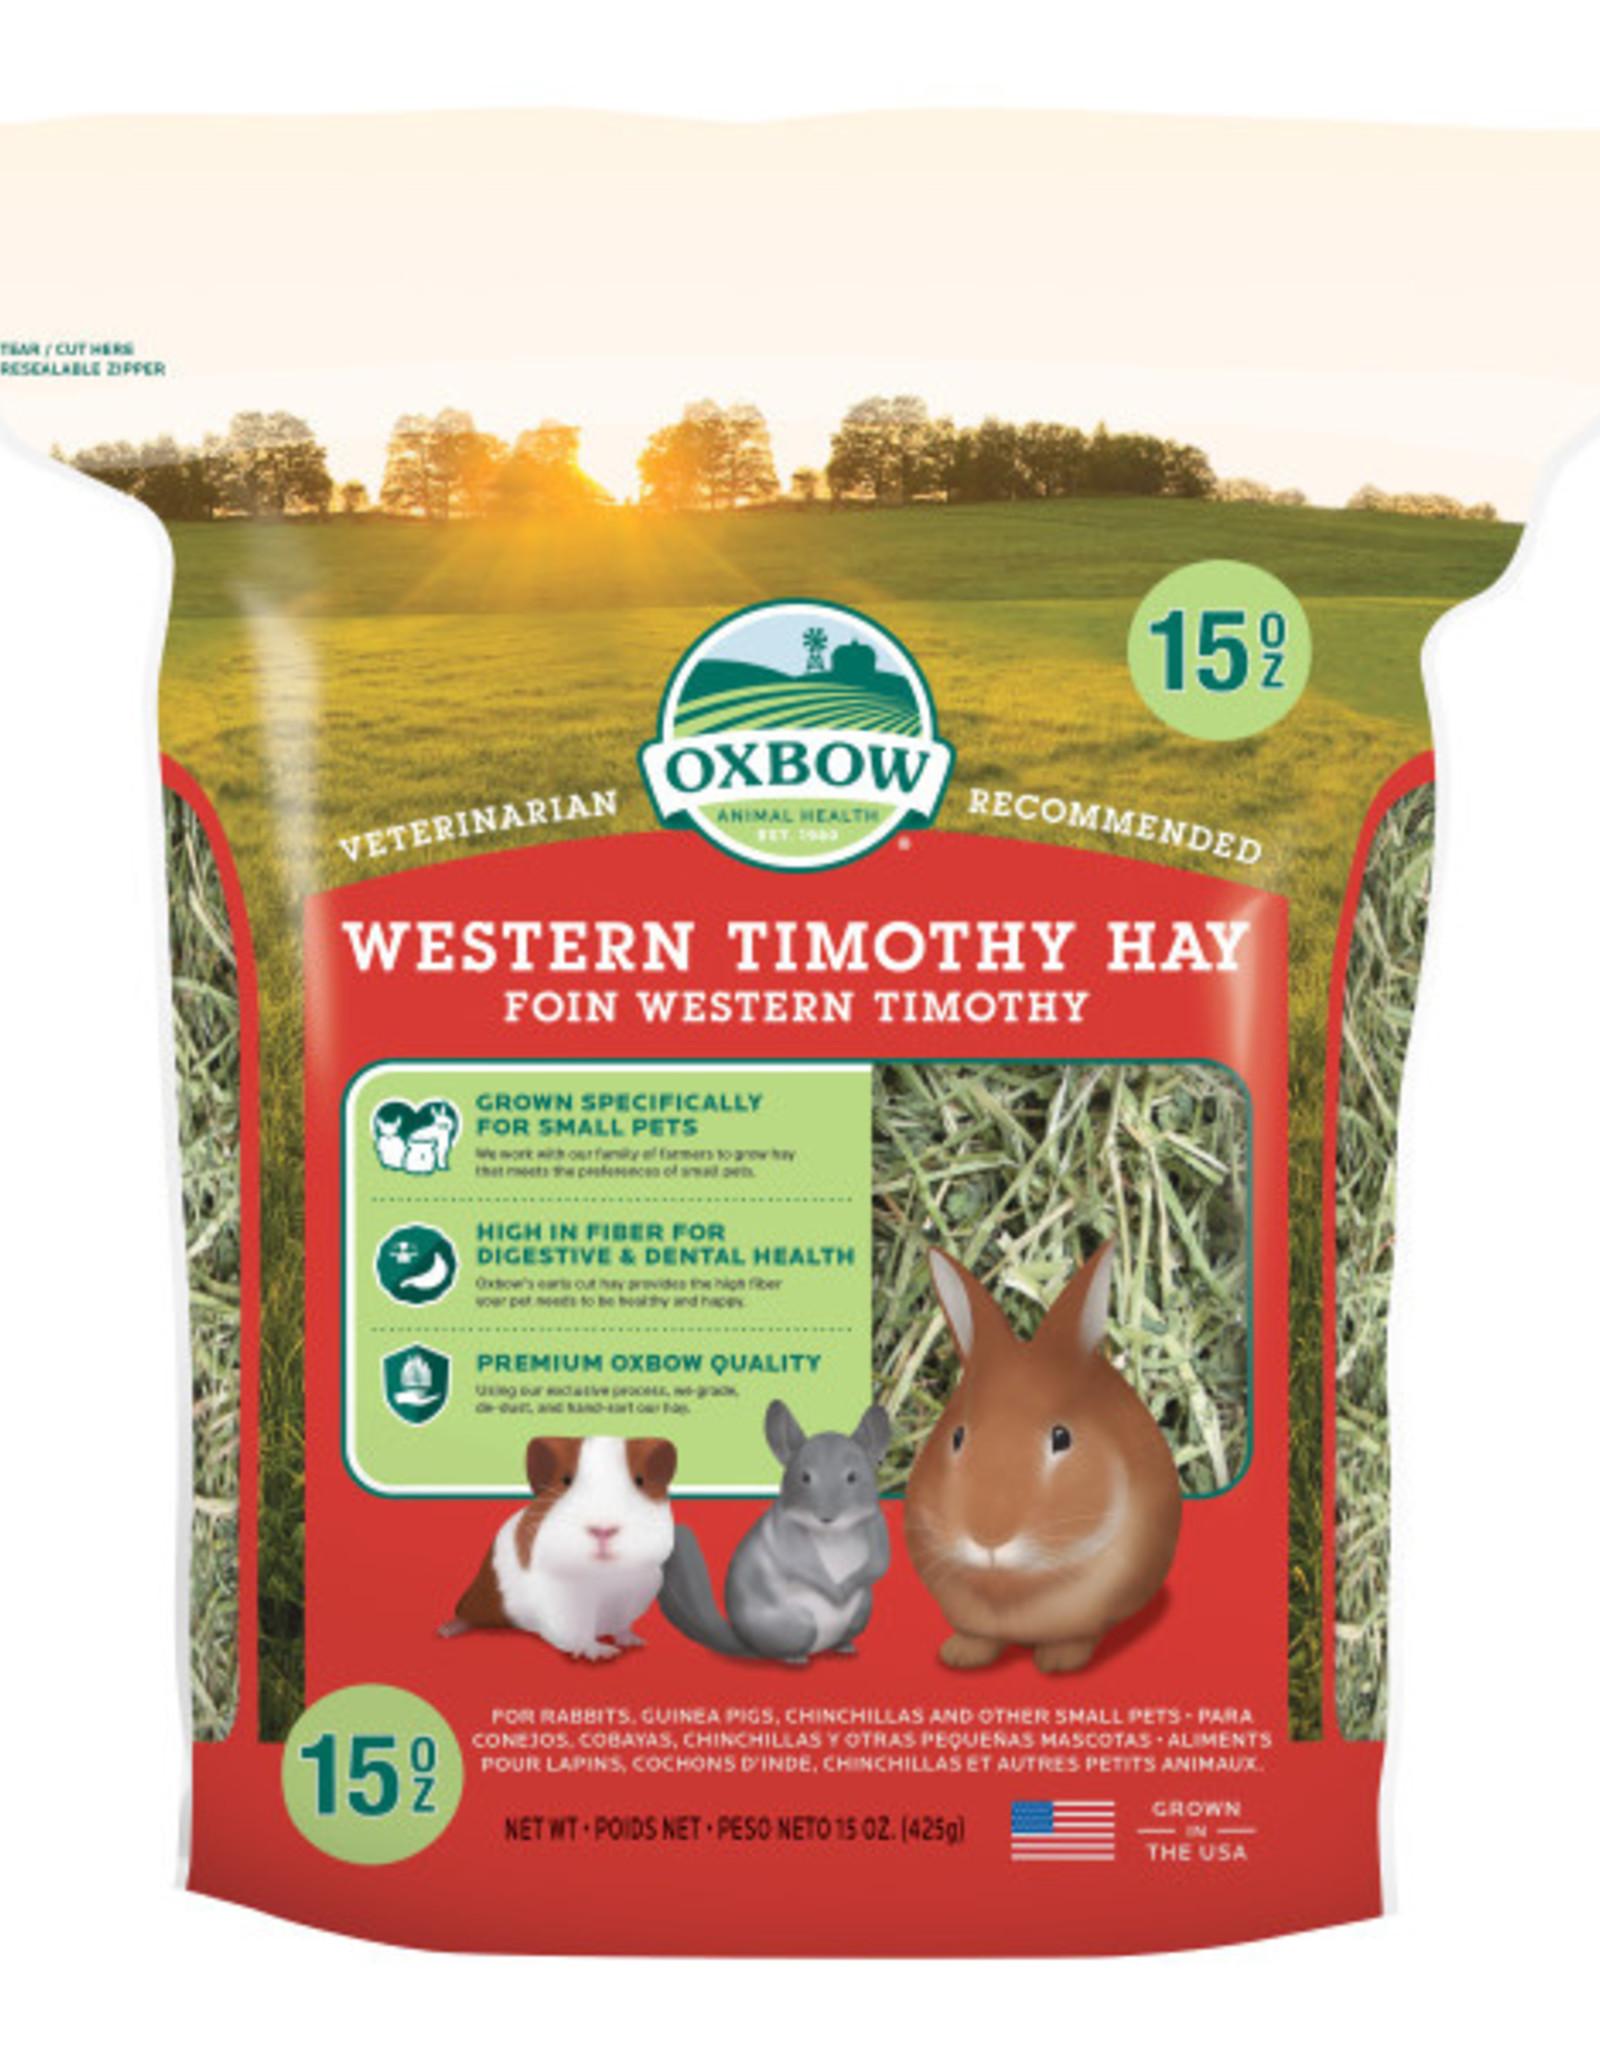 Oxbow Western Timothy Hay 15 oz